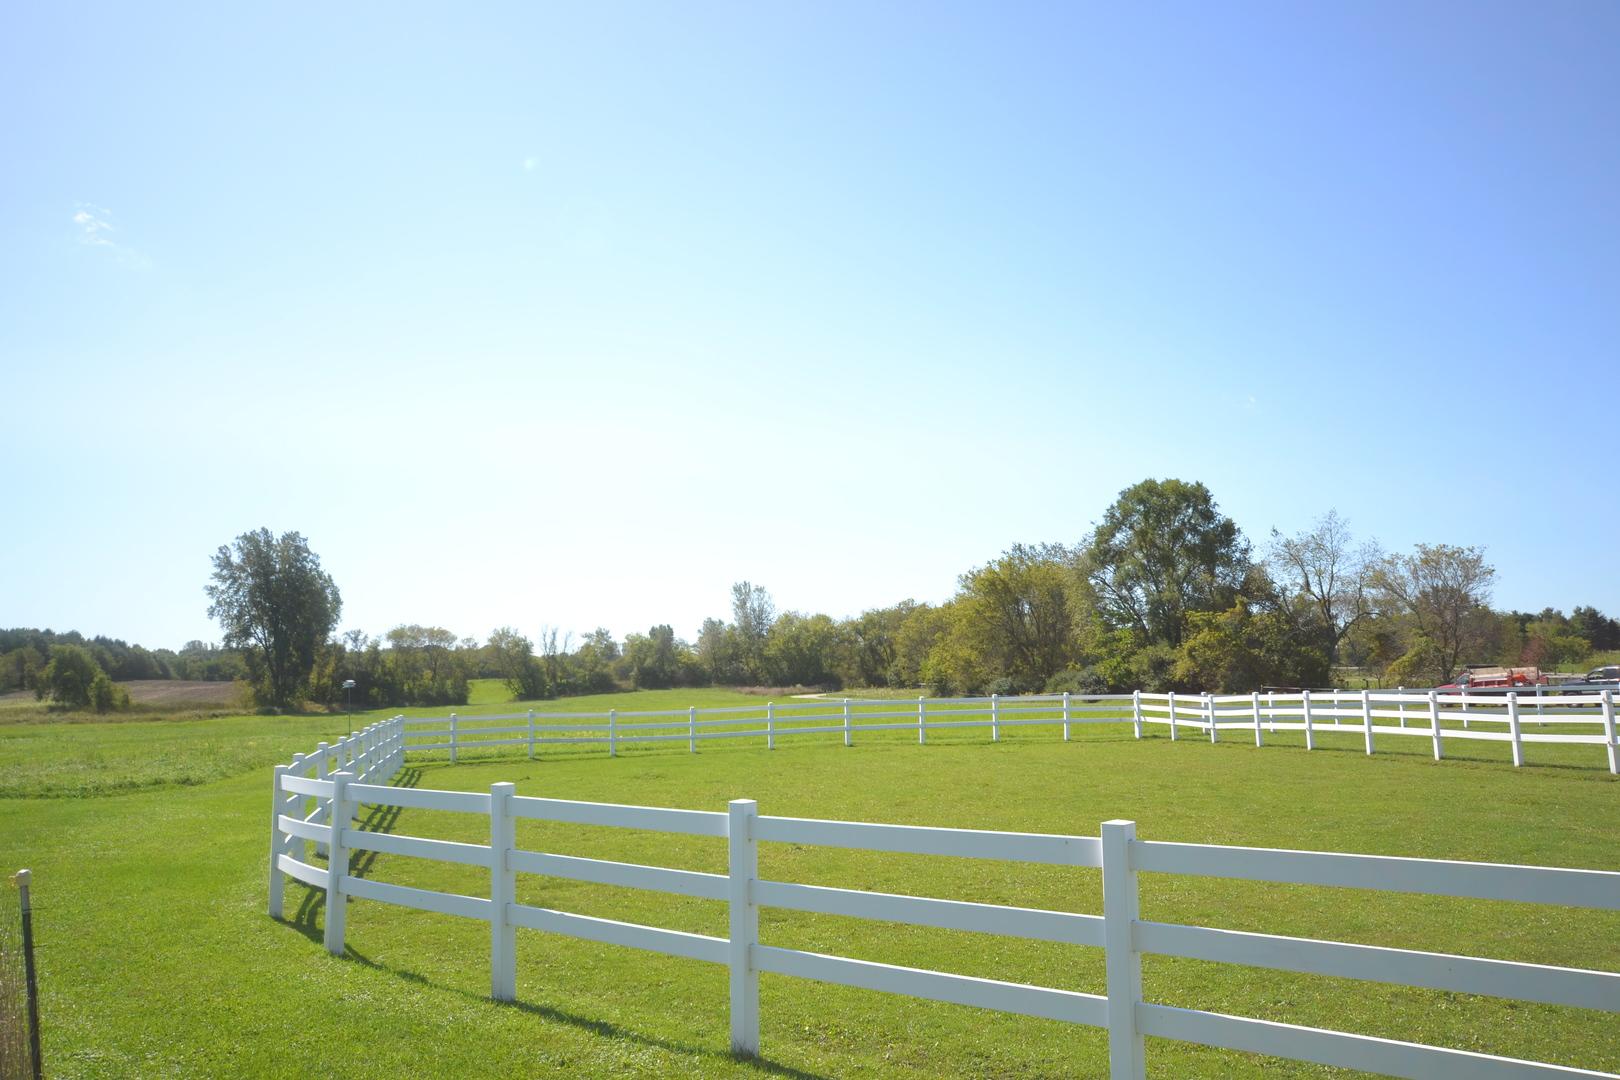 41W201 LENZ, Campton Hills, Illinois, 60124